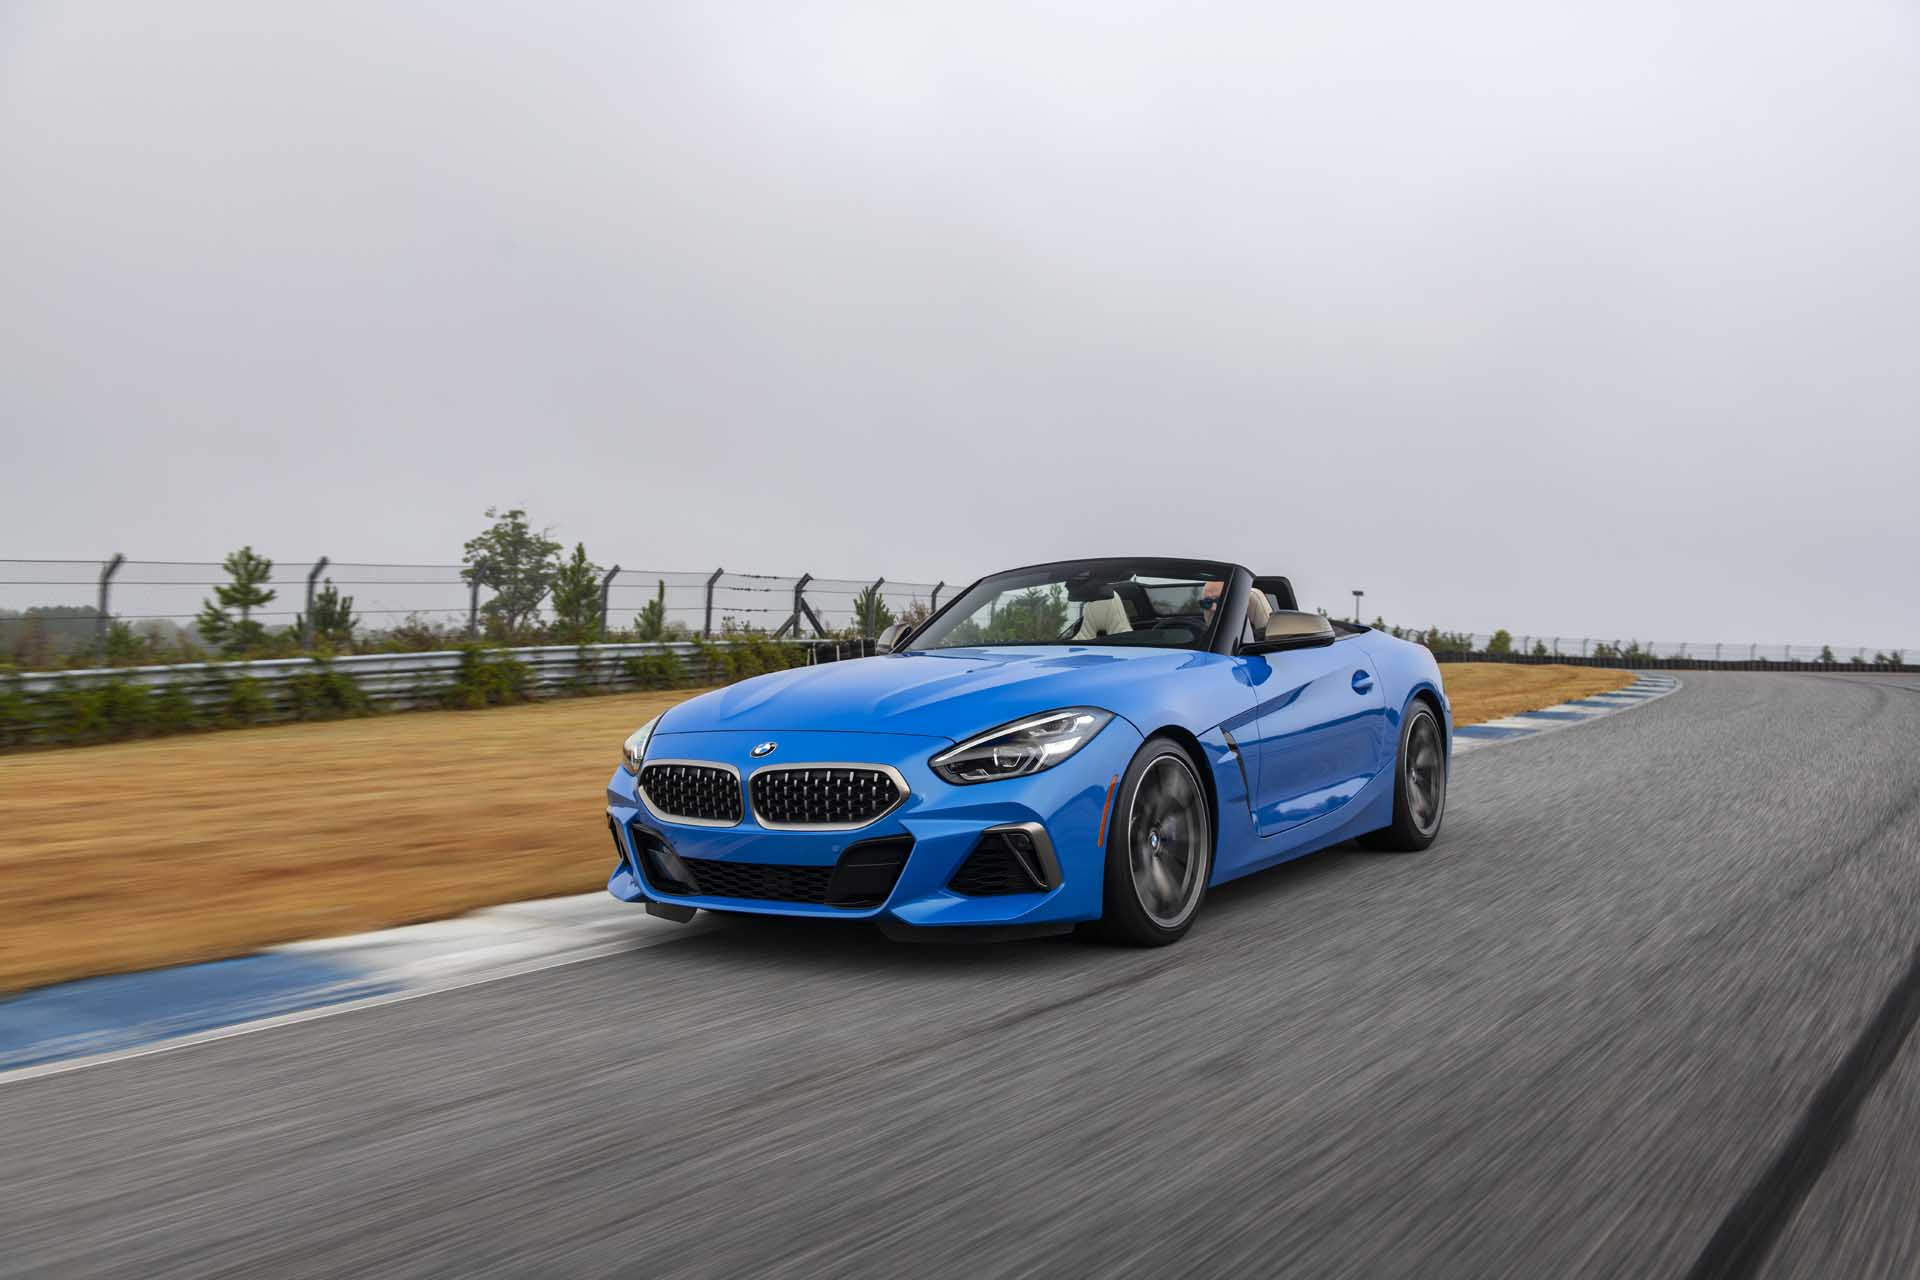 2021 BMW Z4 Roadster Pricing